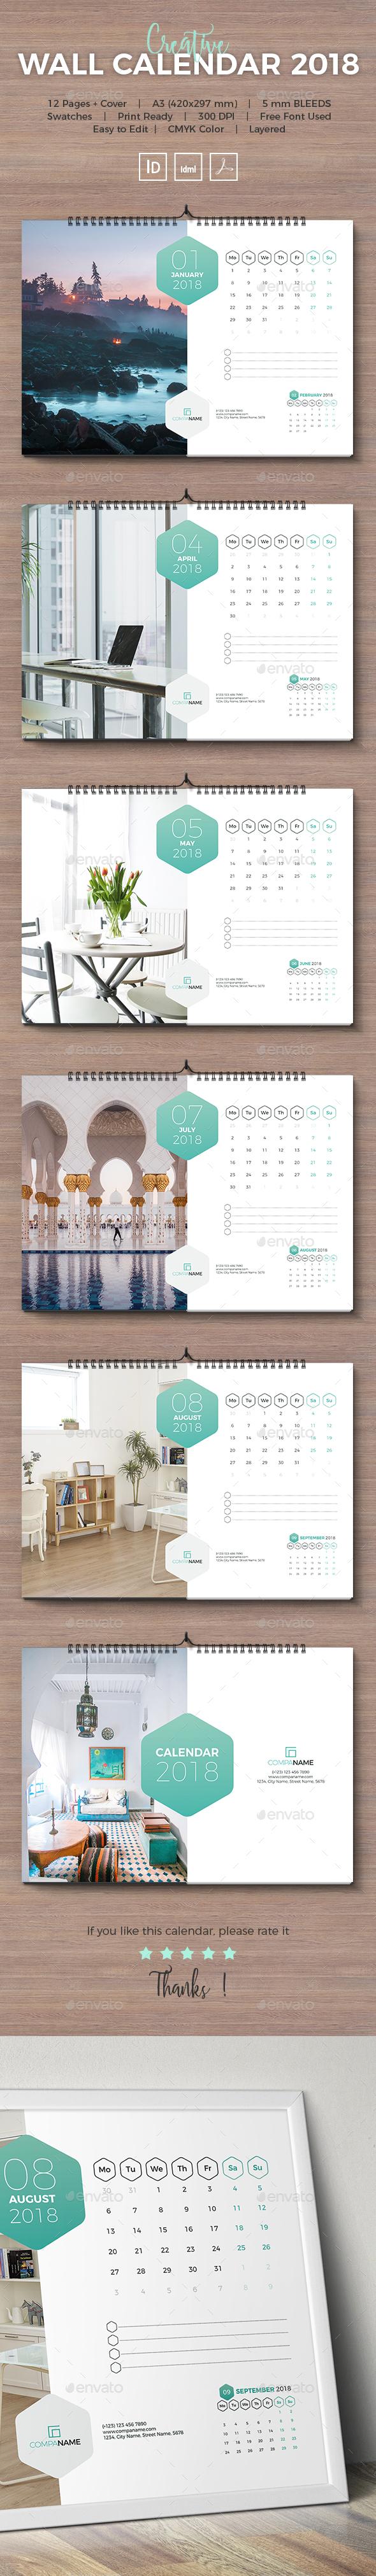 GraphicRiver 2018 Wall Calendar Landscape 21098915